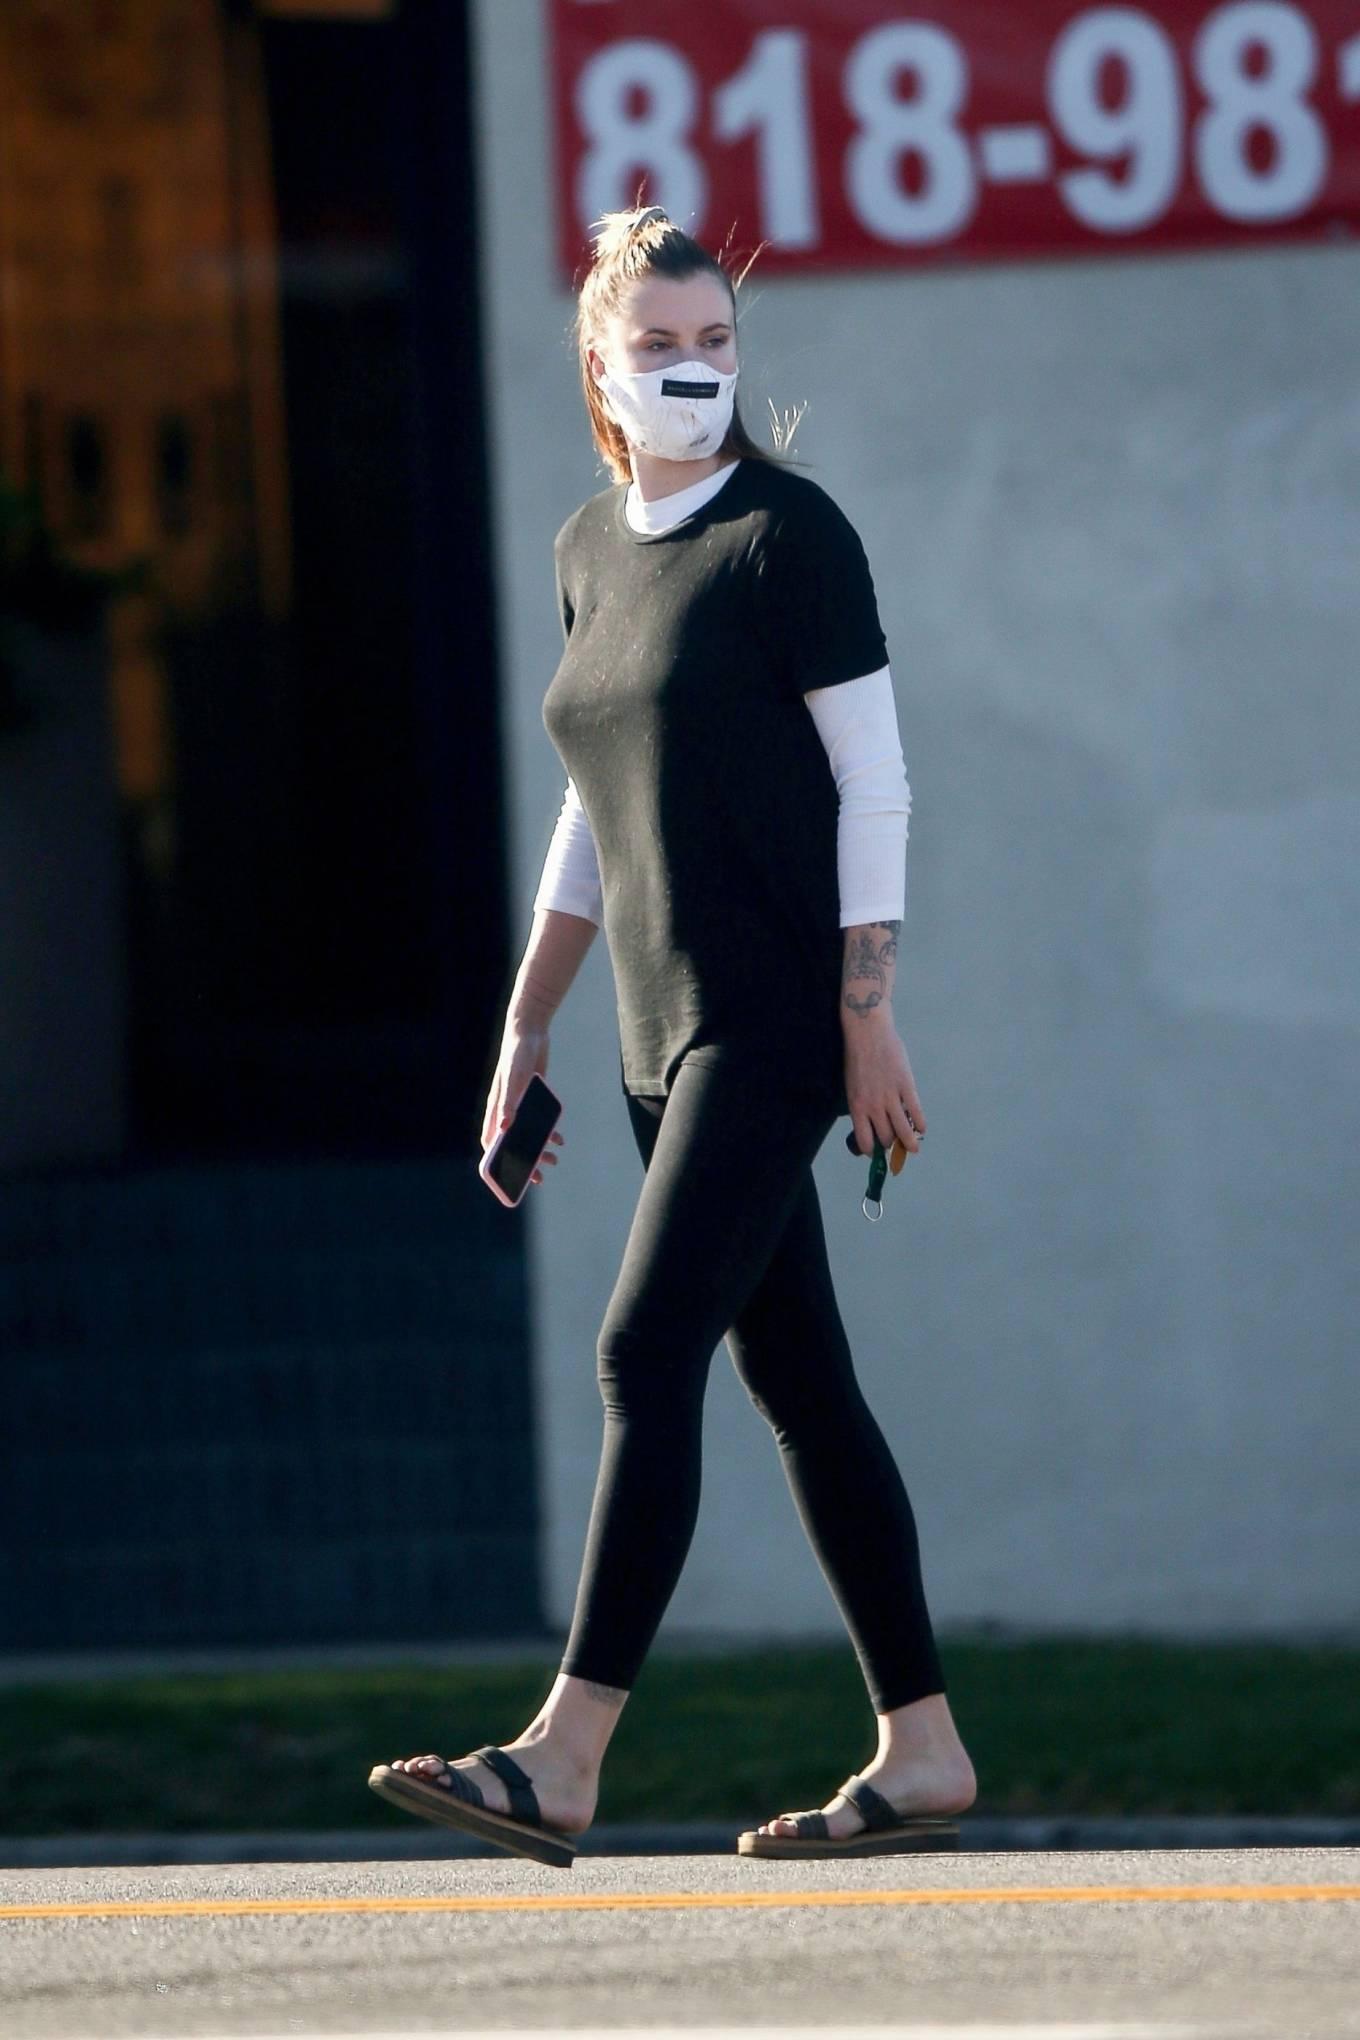 Ireland Baldwin - Wearing mask while run errands in Los Angeles